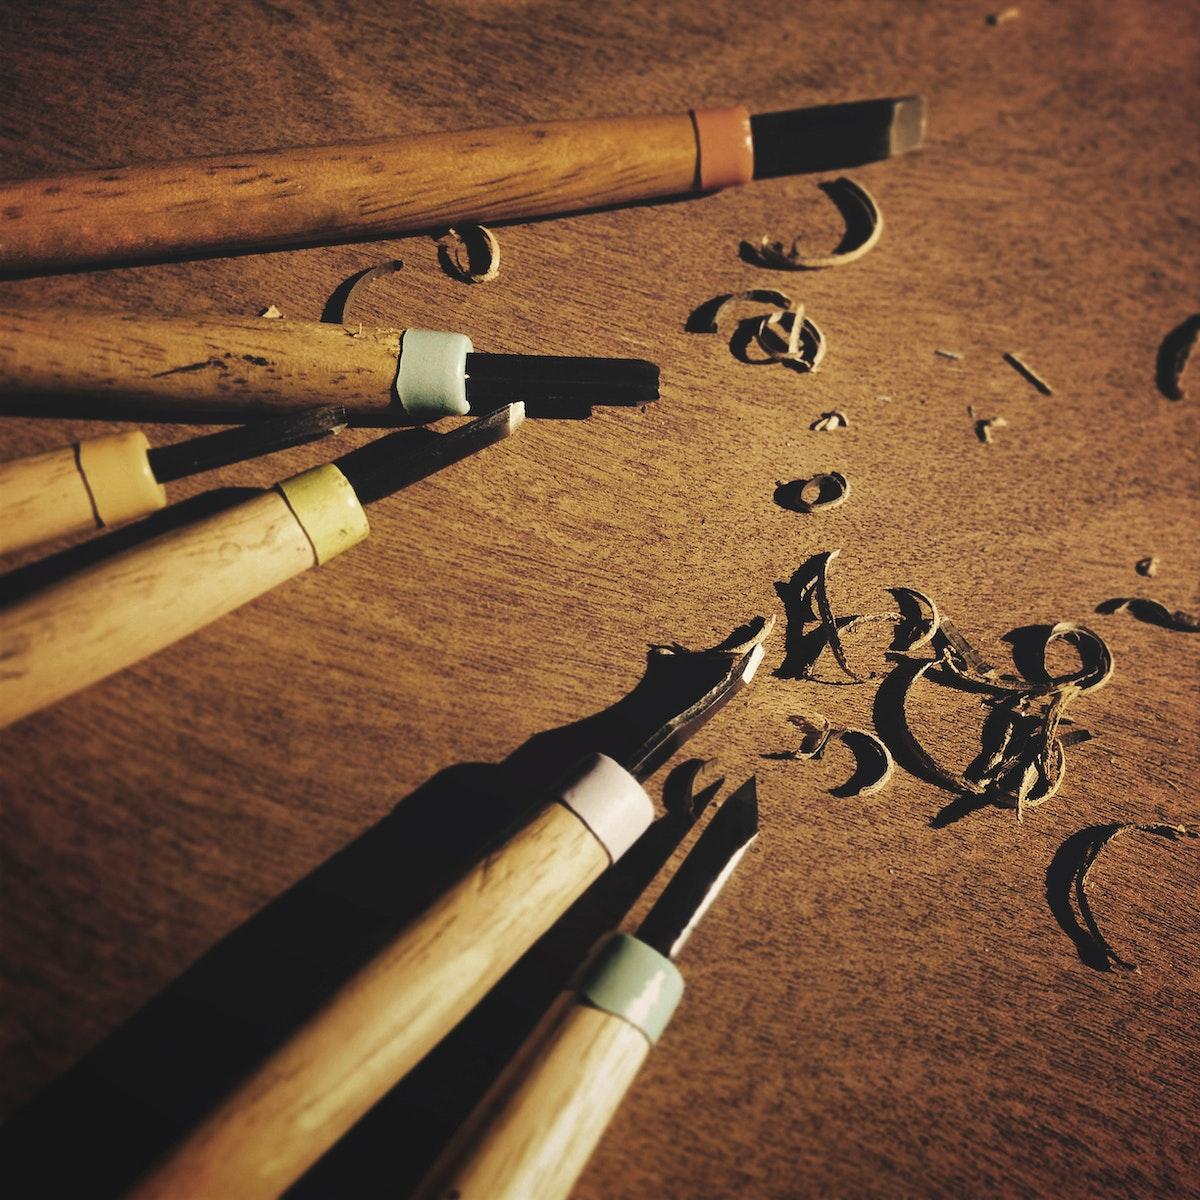 Closeup aerial view of wood sculpter carpenter chisel tools